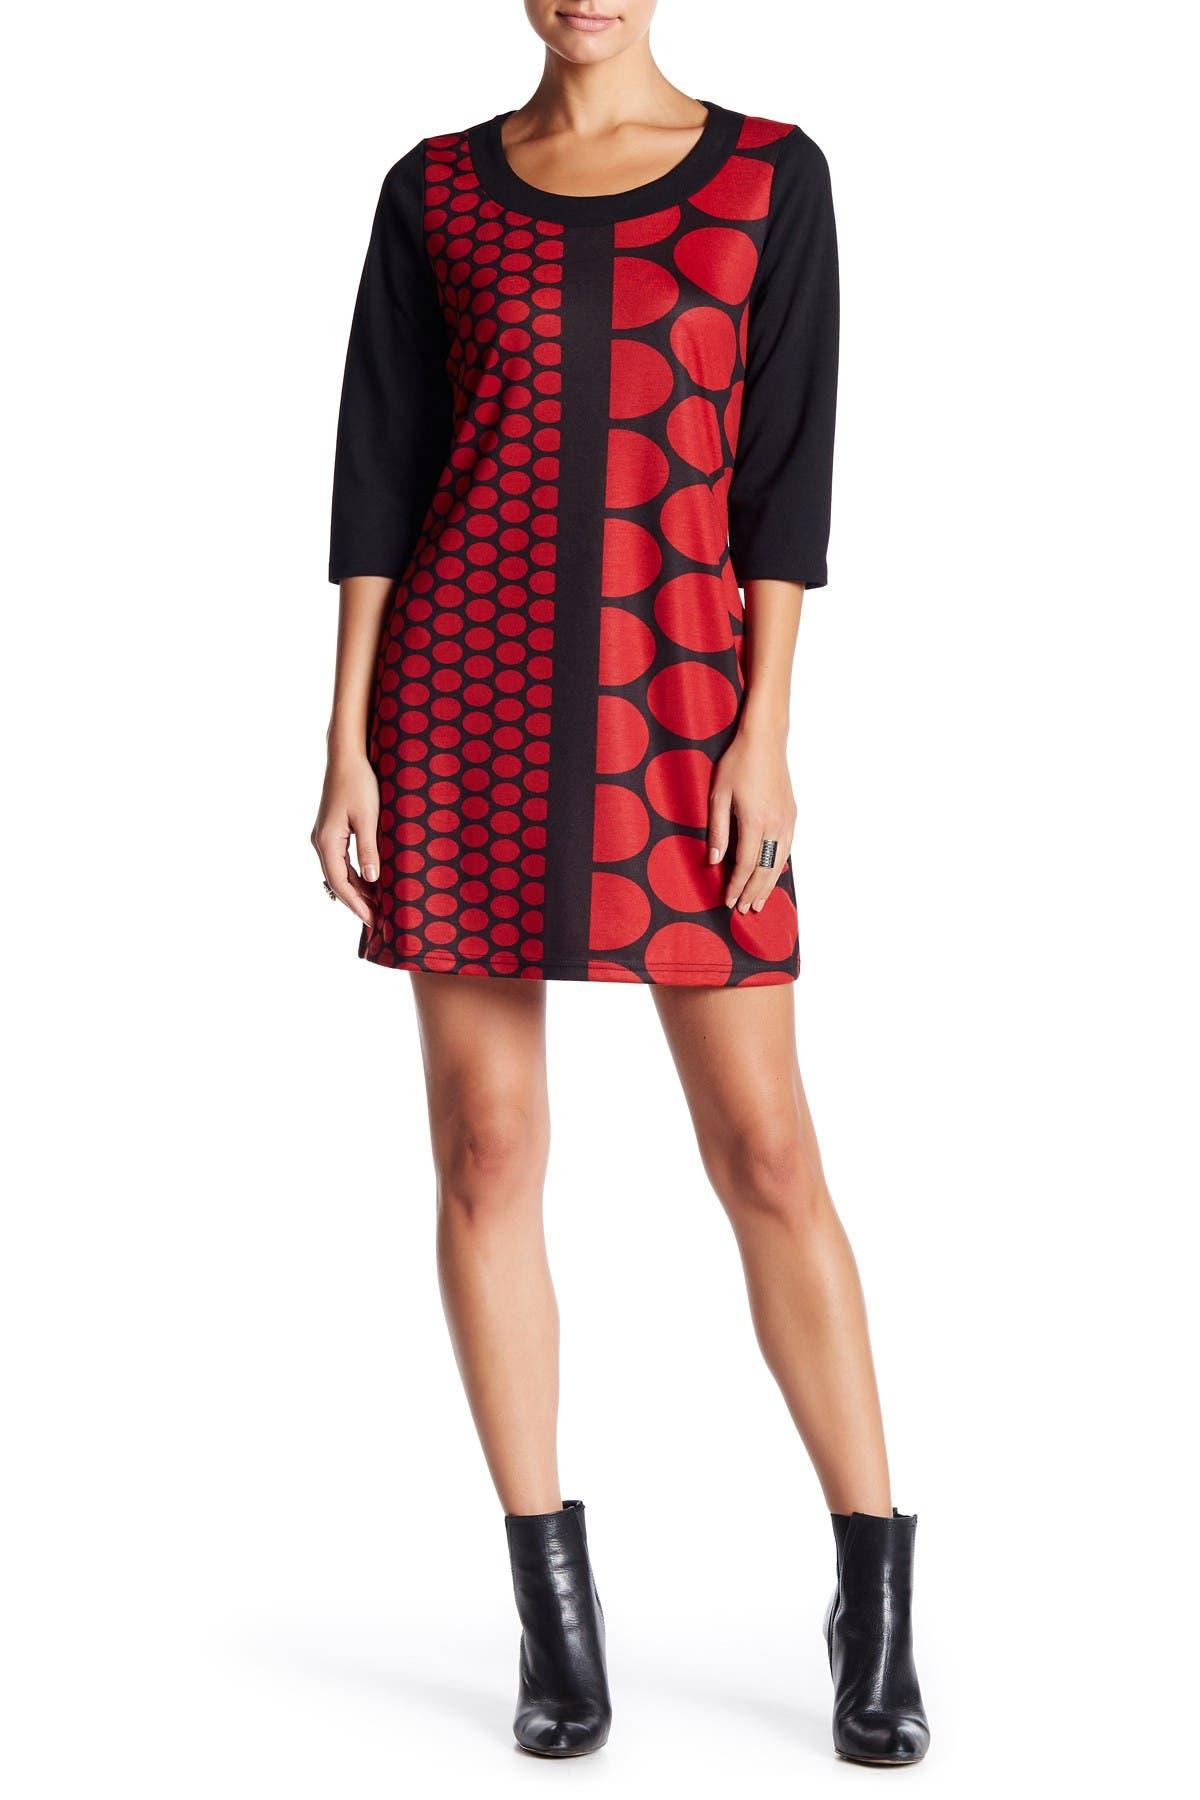 Image of Papillon Geo Print Dress